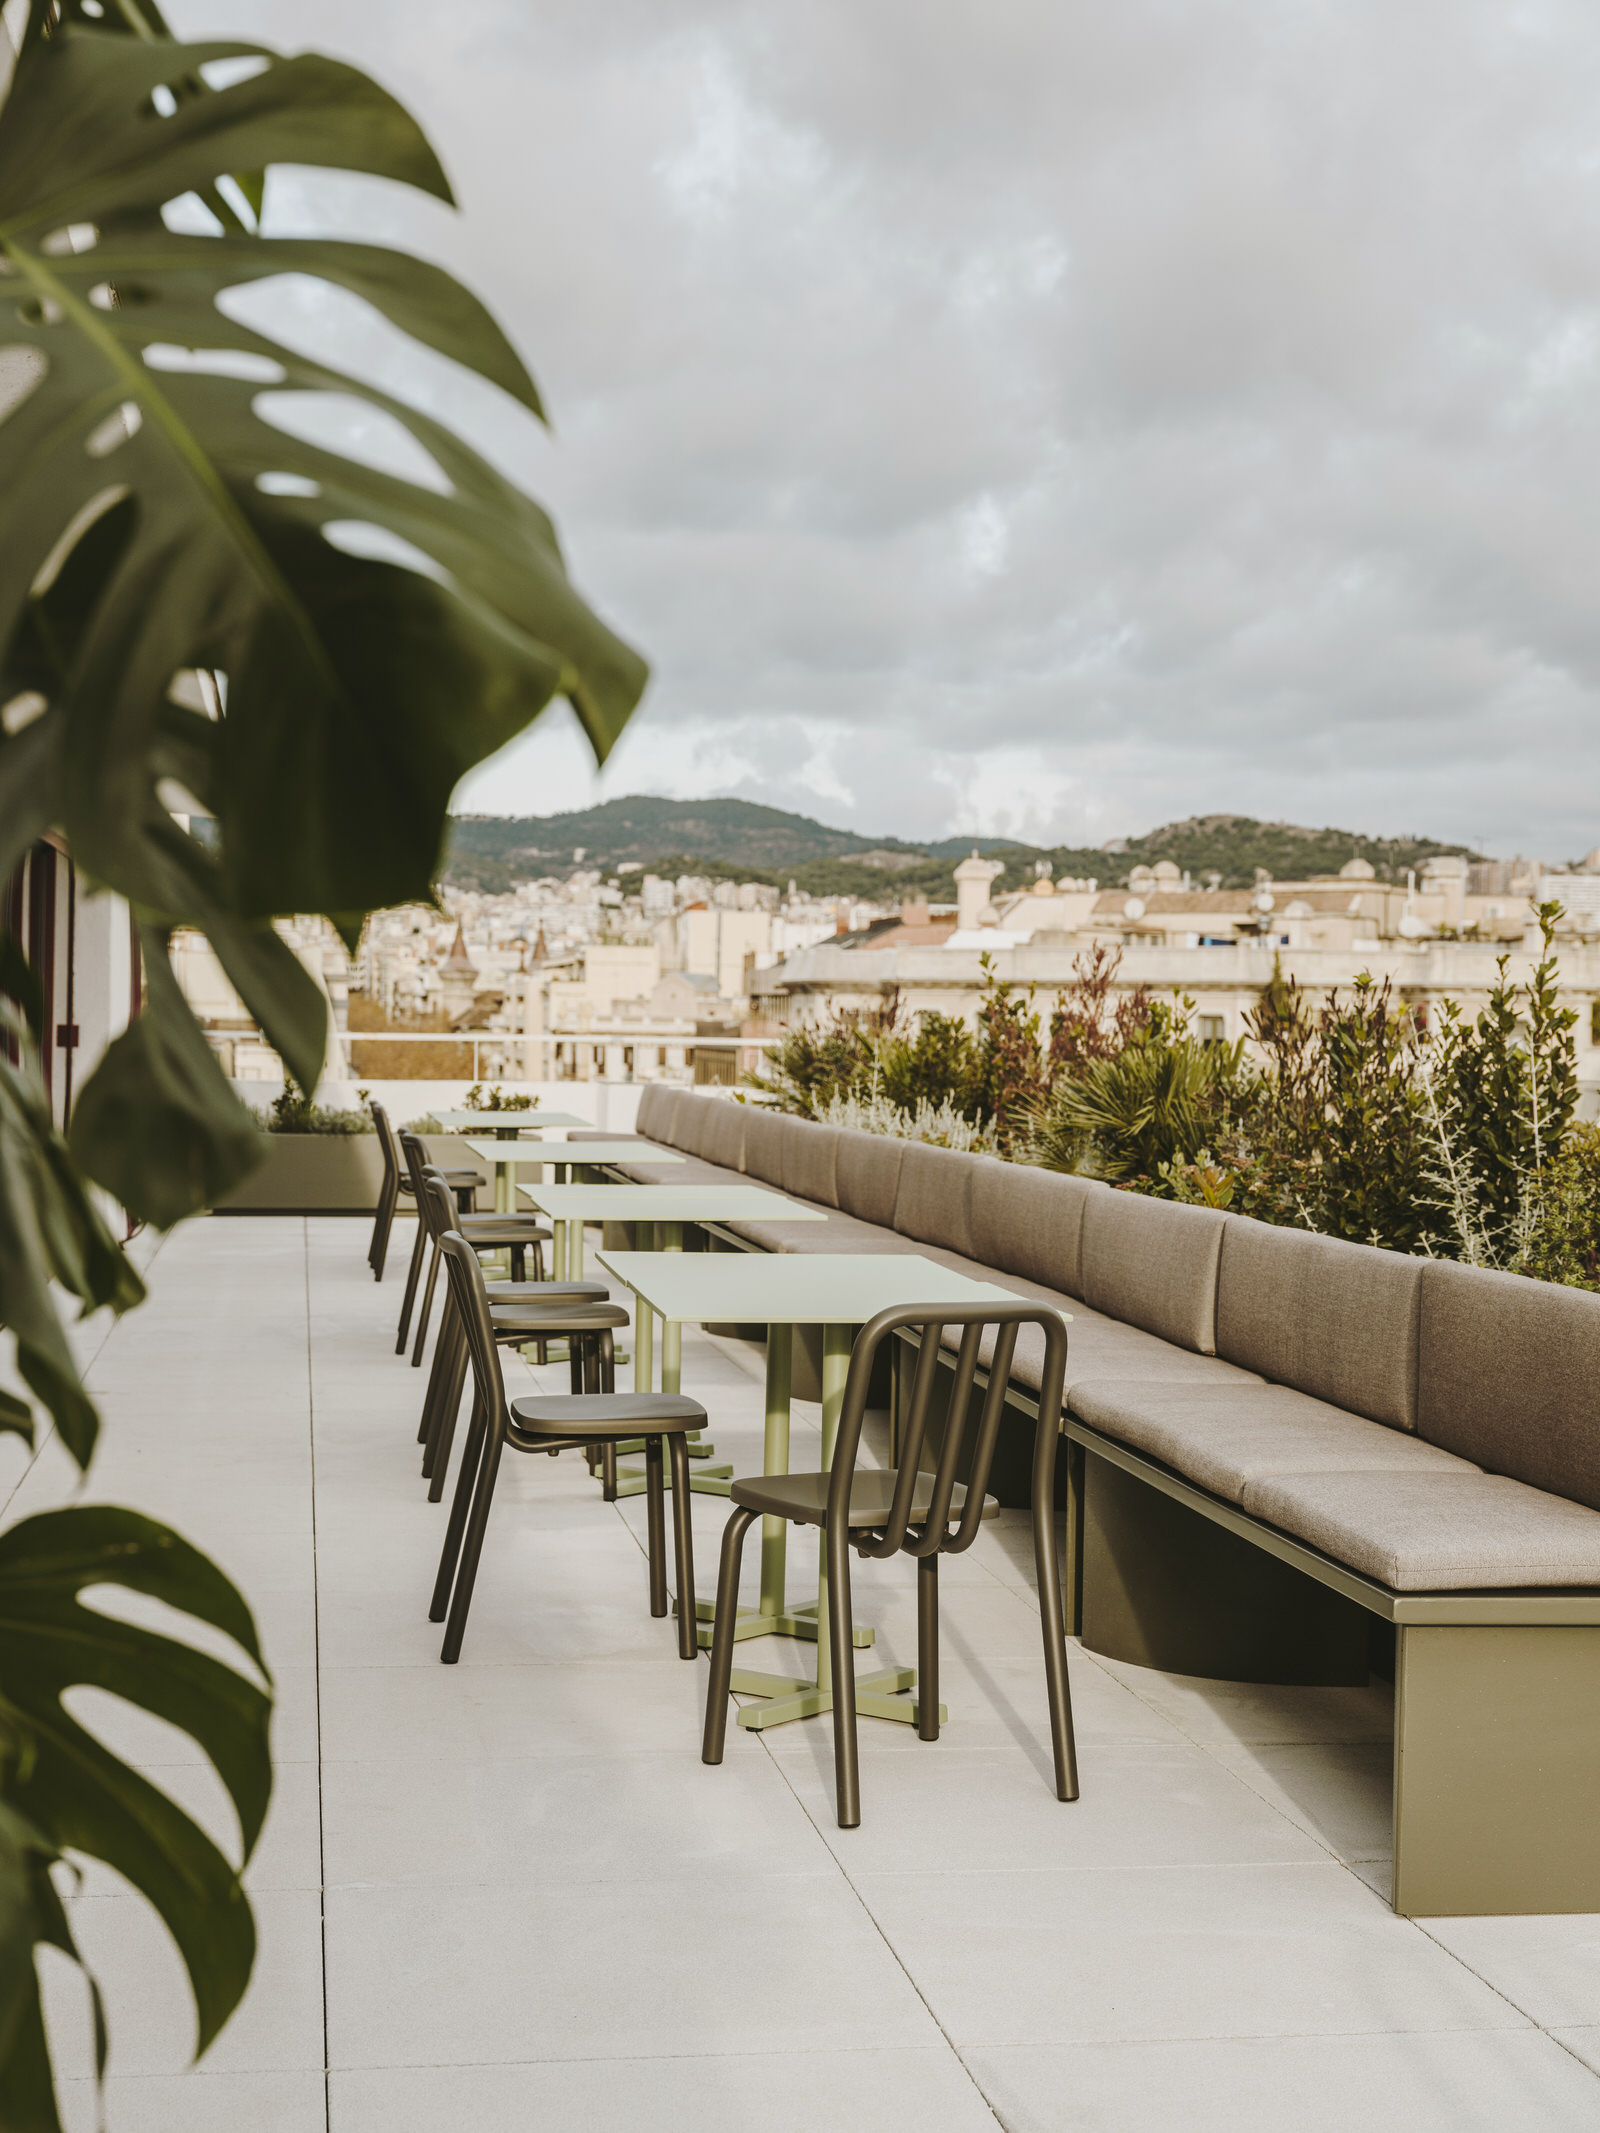 Mesura Architecture Design Cloudworks Penthouse Office Barcelona Photo Salva Lopez Yellowtrace 02